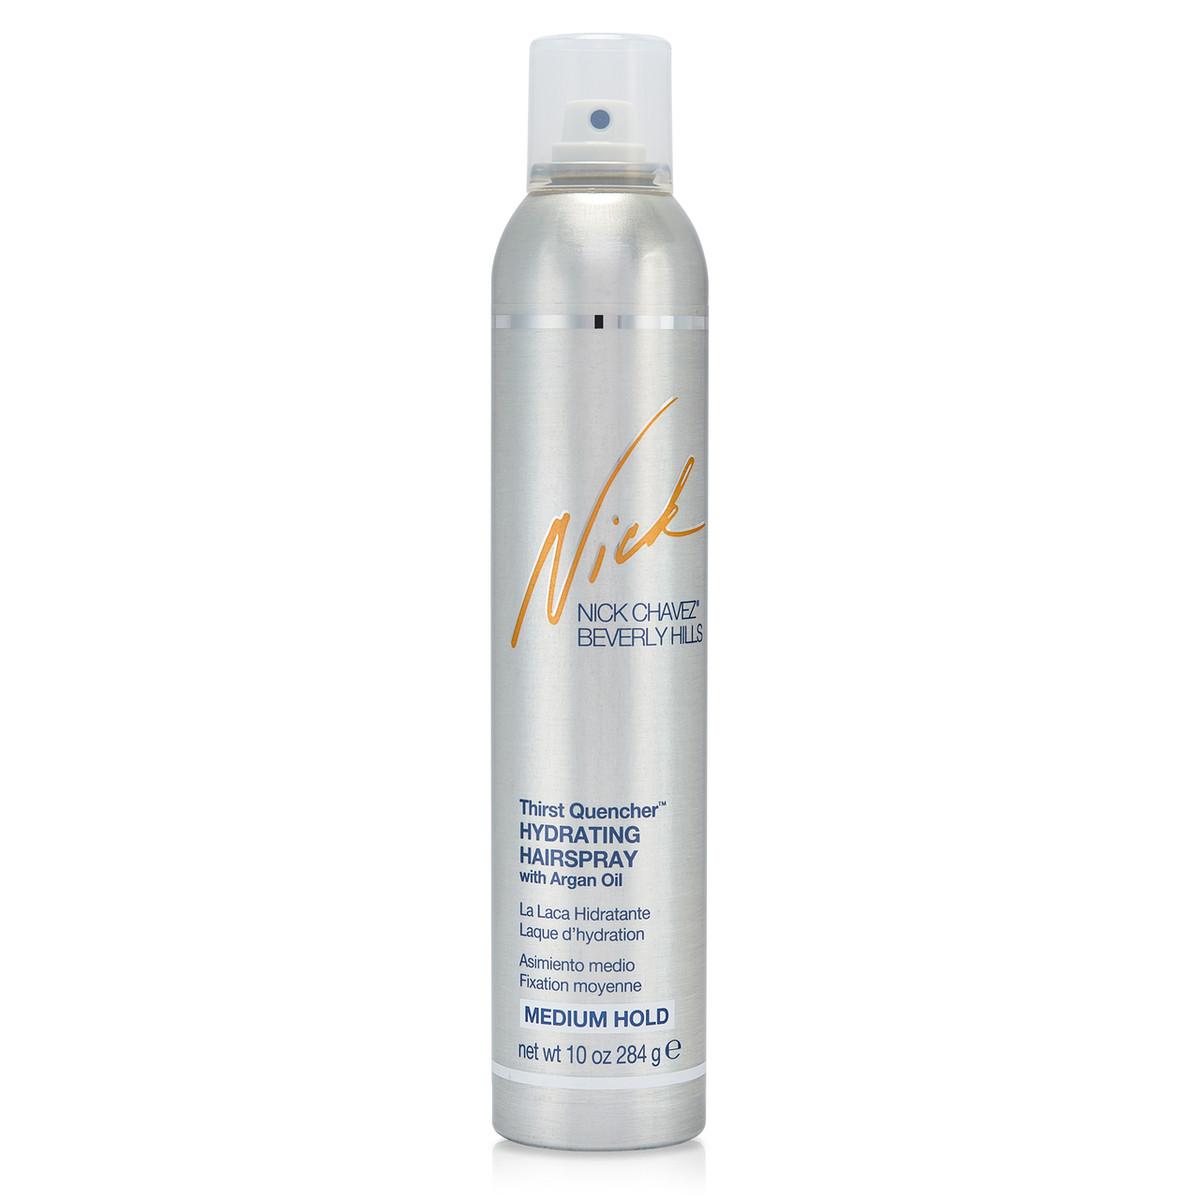 Thirst Quencher Hydrating Hairspray 10oz